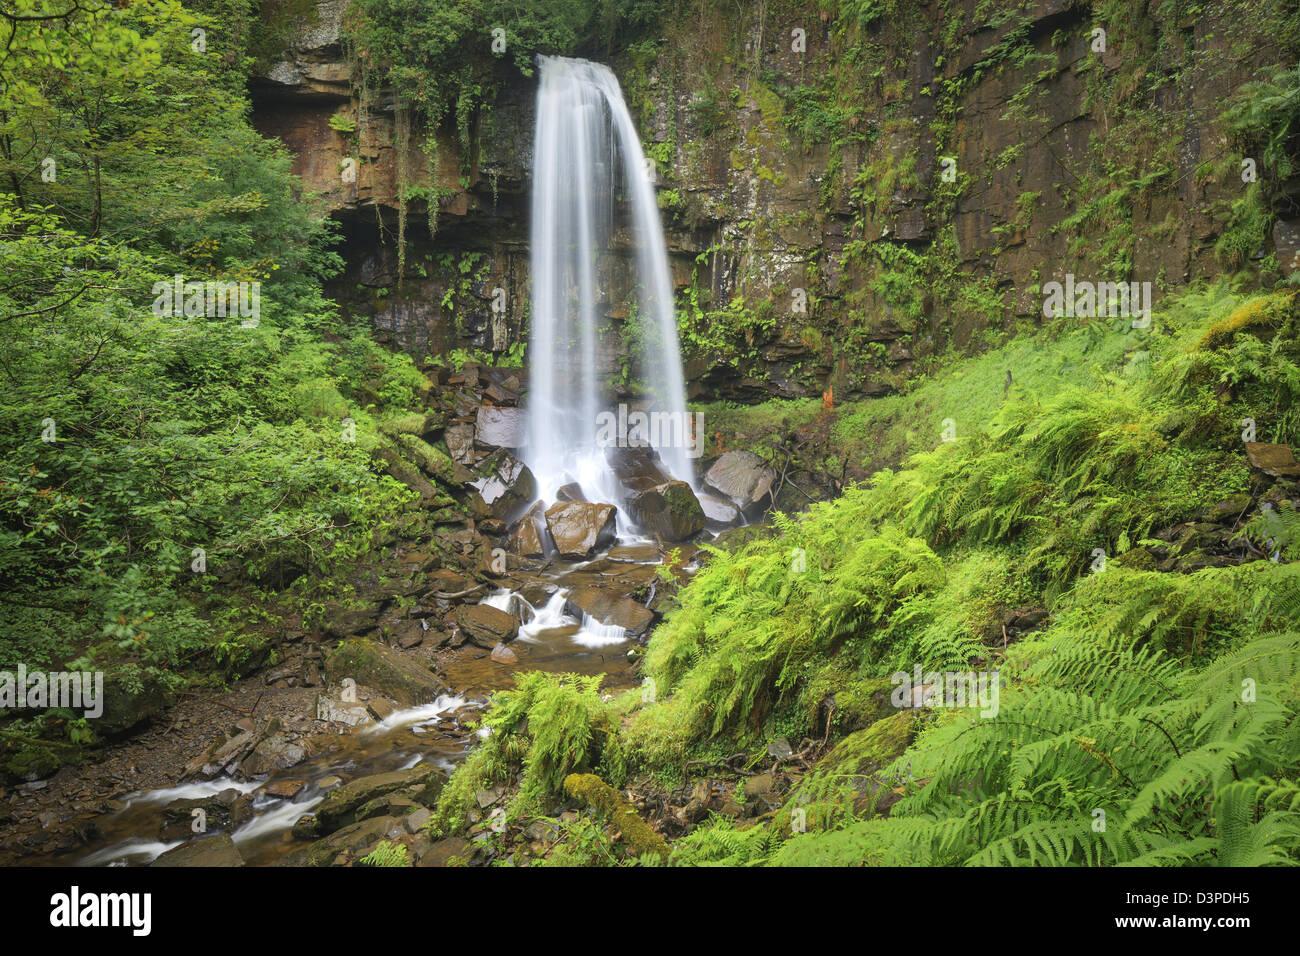 Melin Gericht (auch Melin Cwrt) Wasserfall Resolven Vale of Neath Neath & Port Talbot, South Wales UK Stockbild